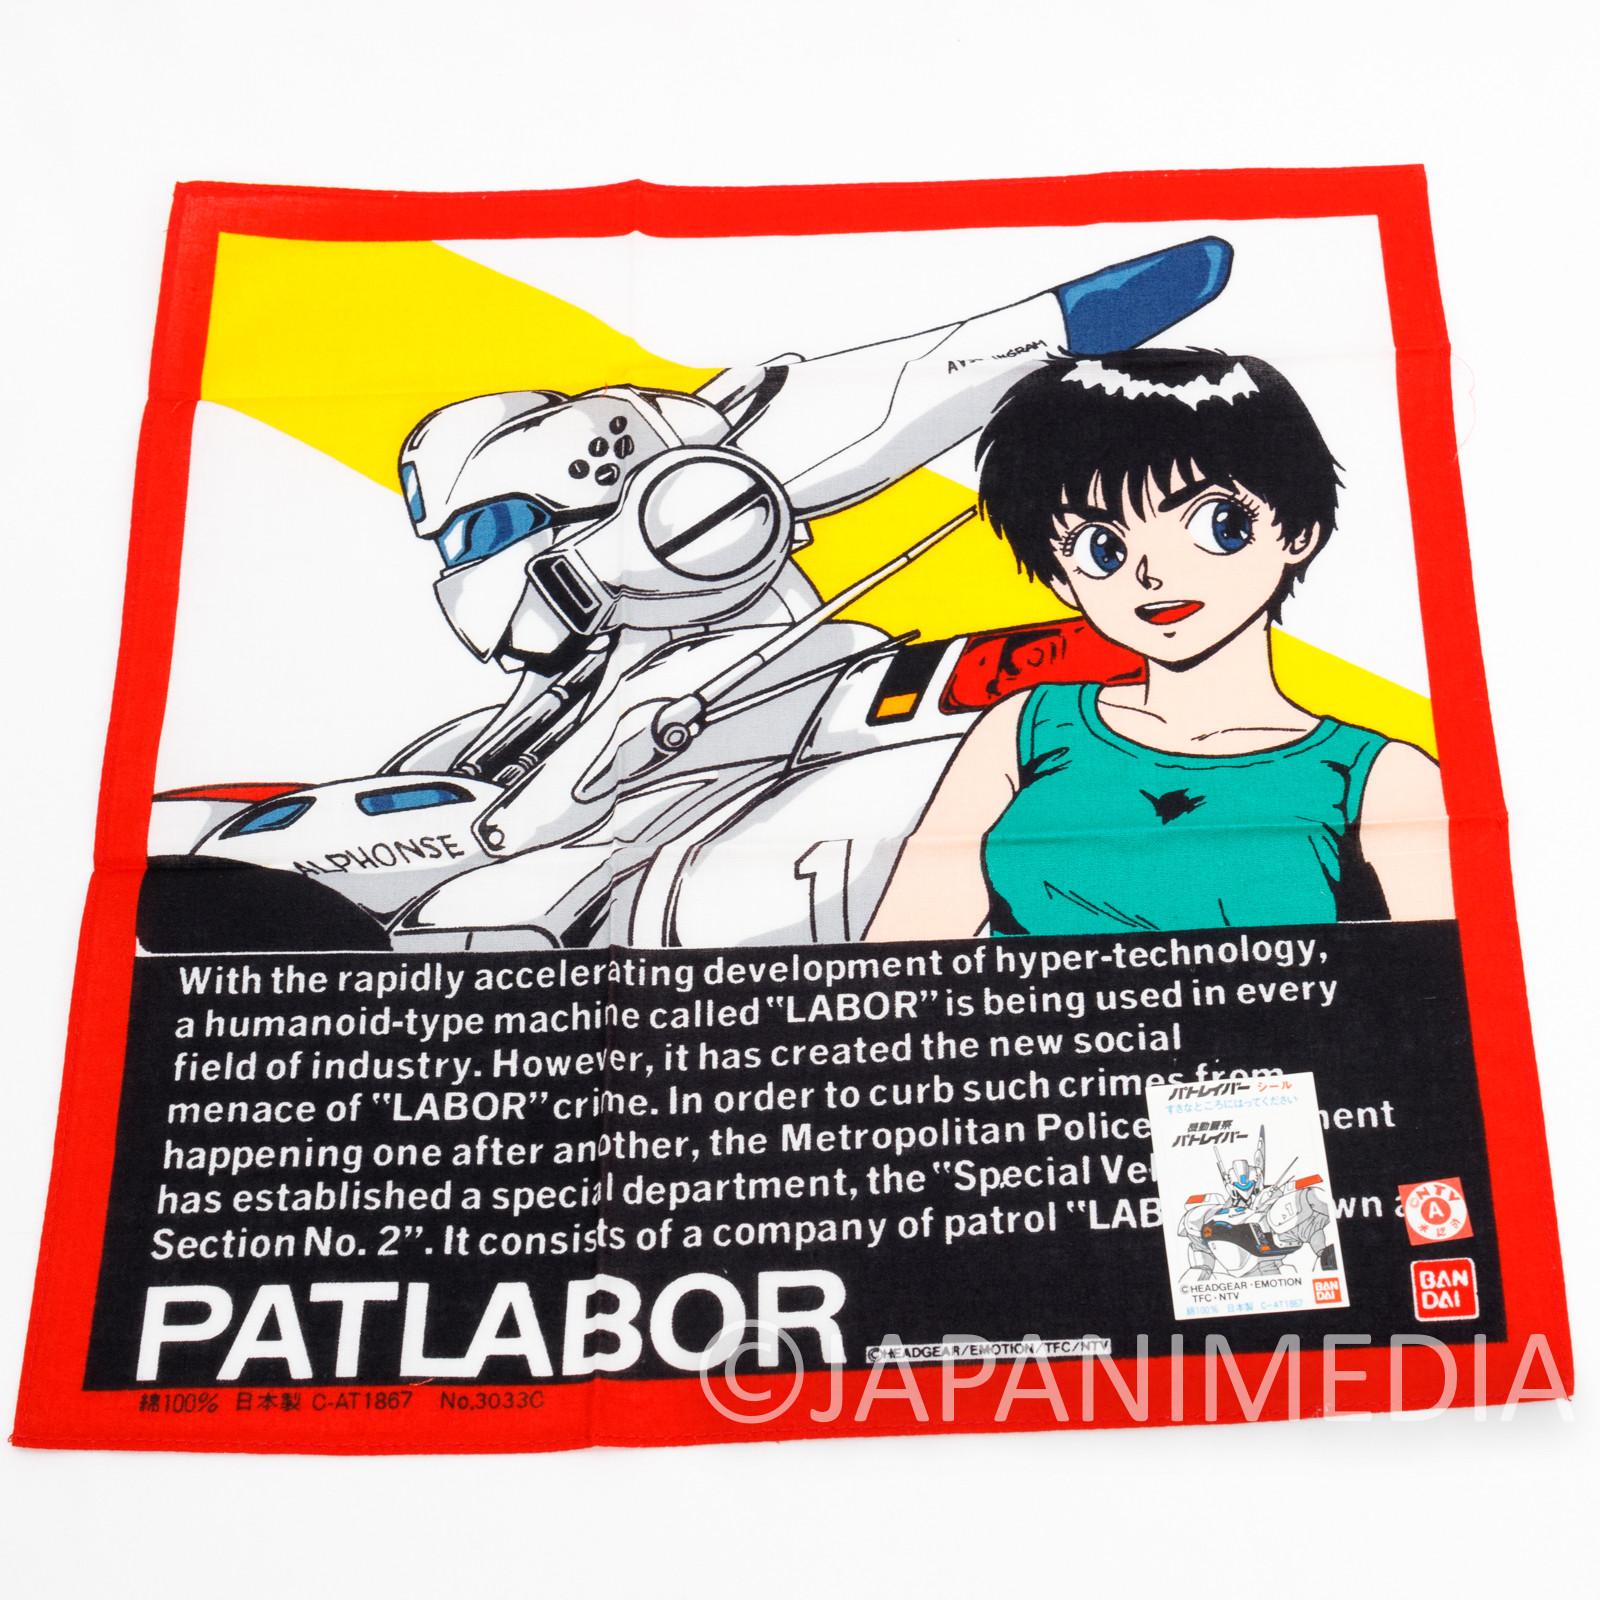 Patlabor Ingram & Noa Izumi Handkerchief JAPAN ANIME